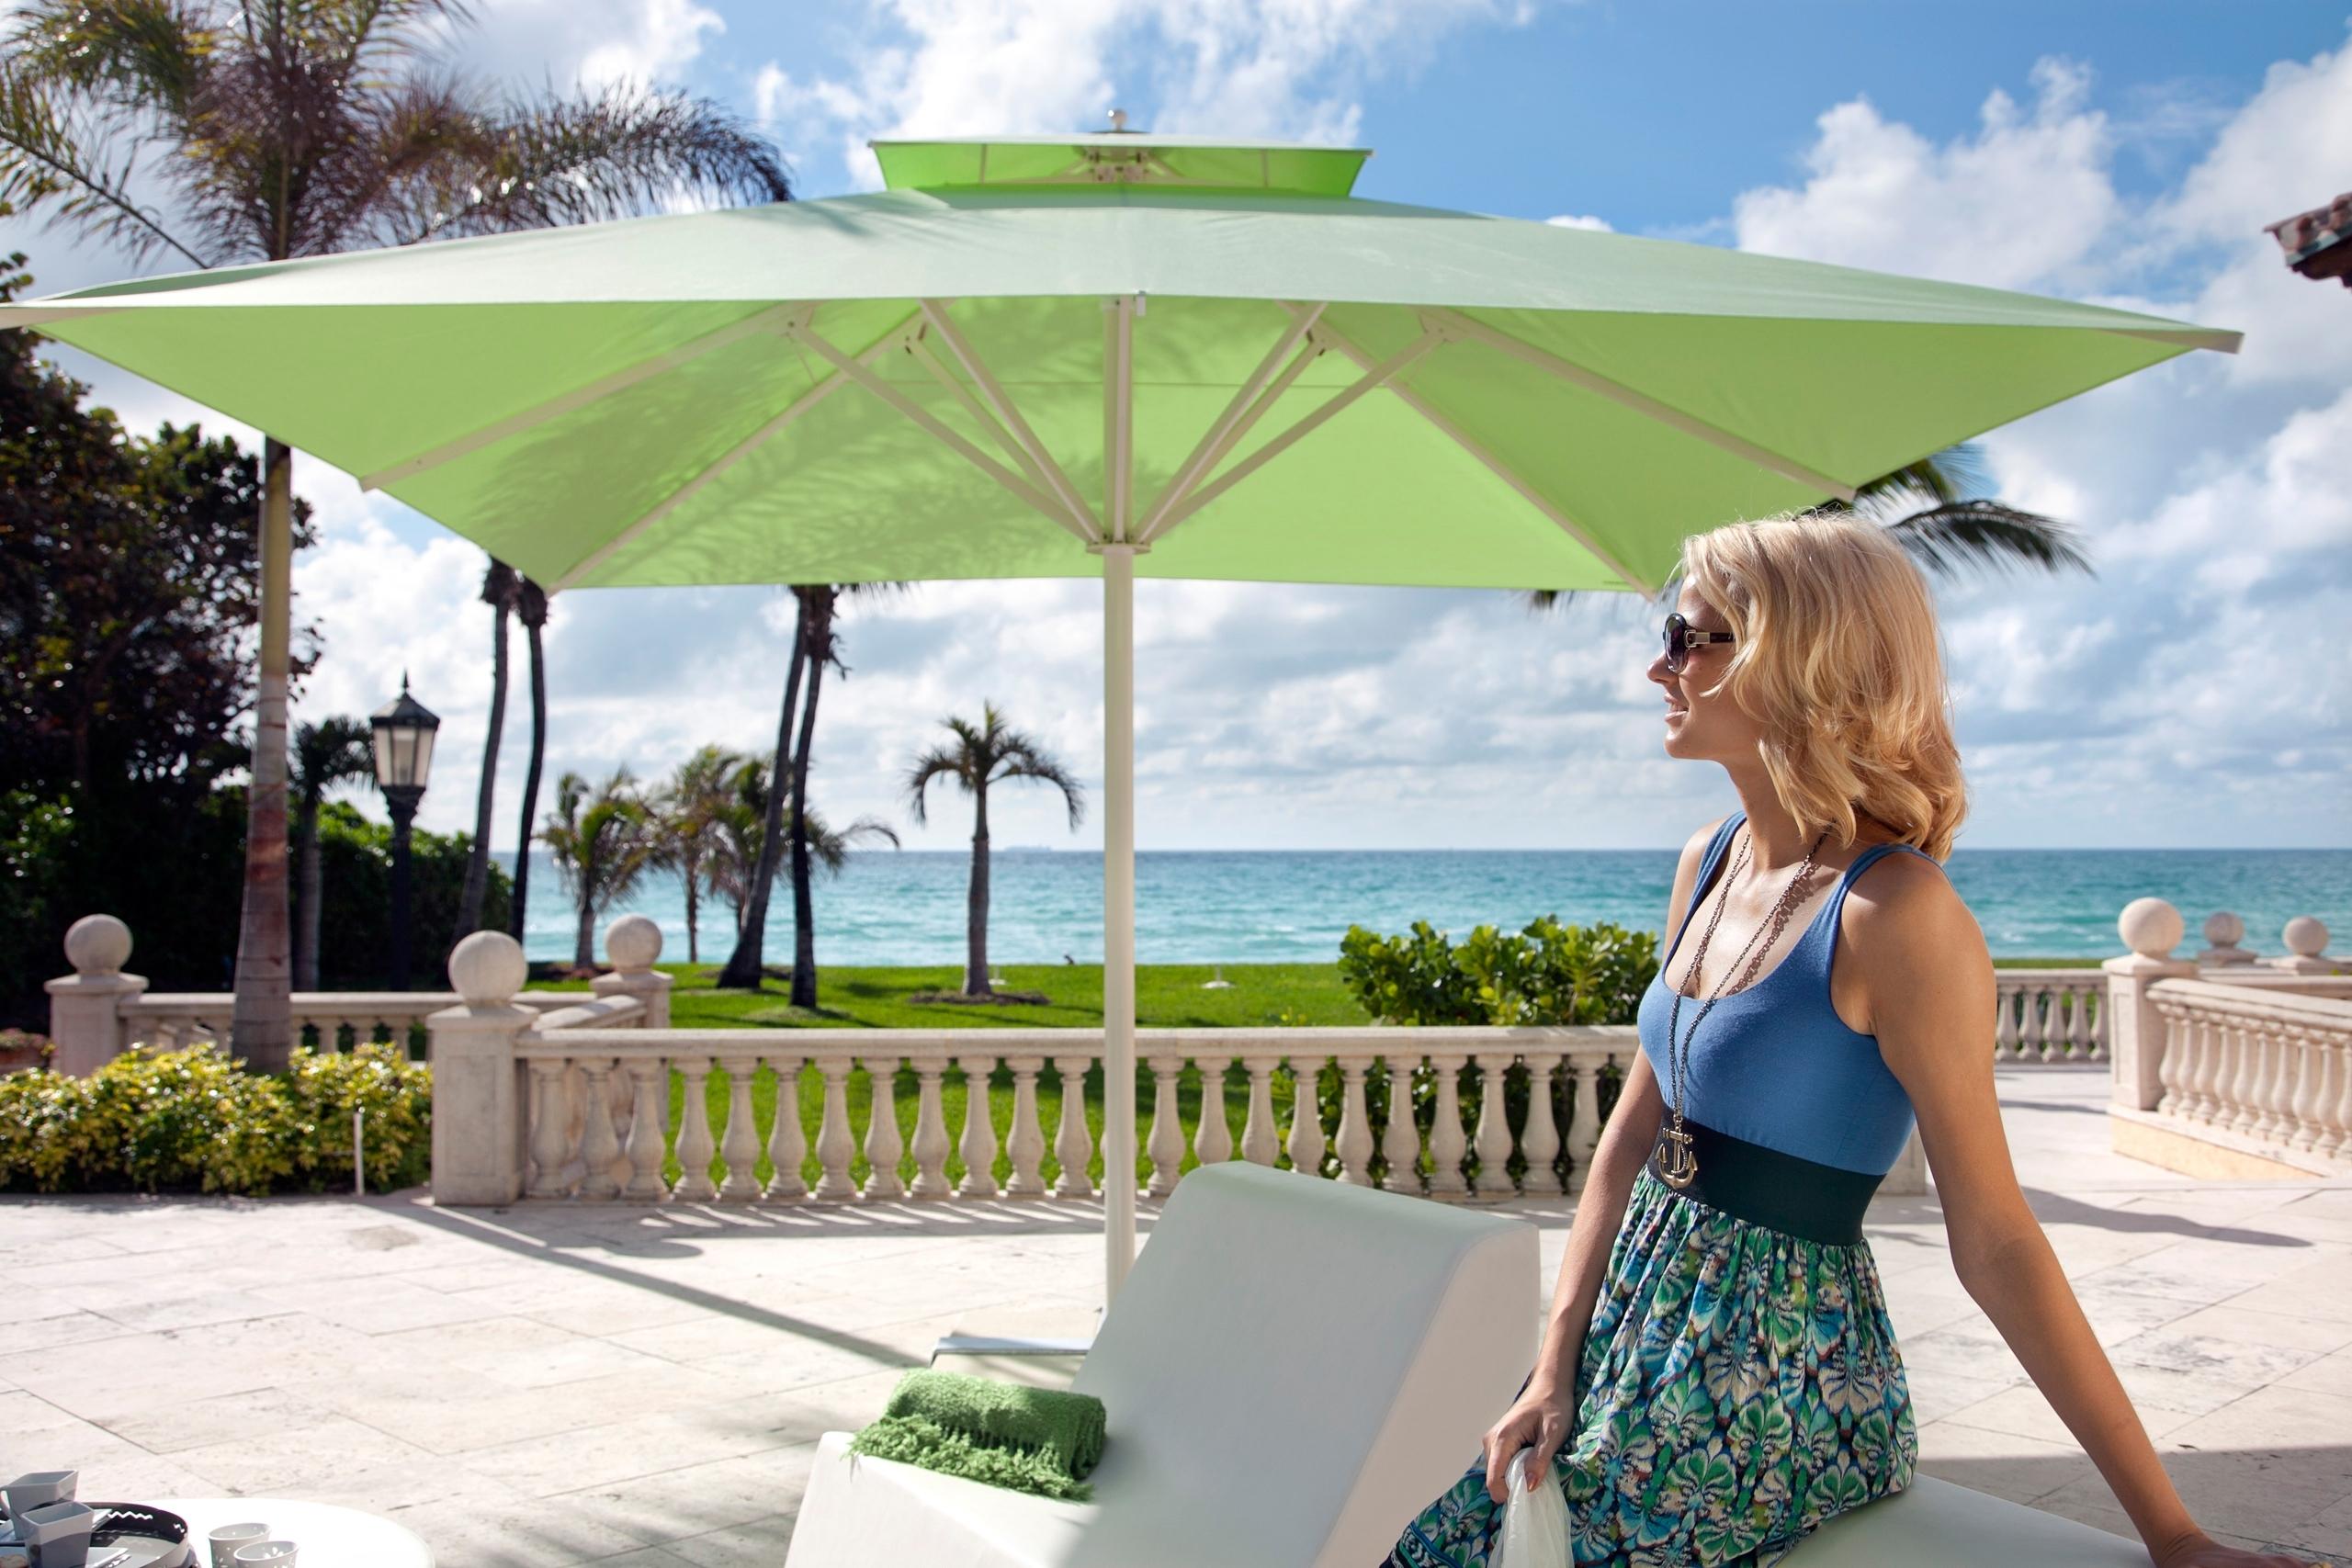 Fashionable Jumbo Patio Umbrellas Inside Square Dimension For Giant Patio Umbrellas (View 3 of 20)